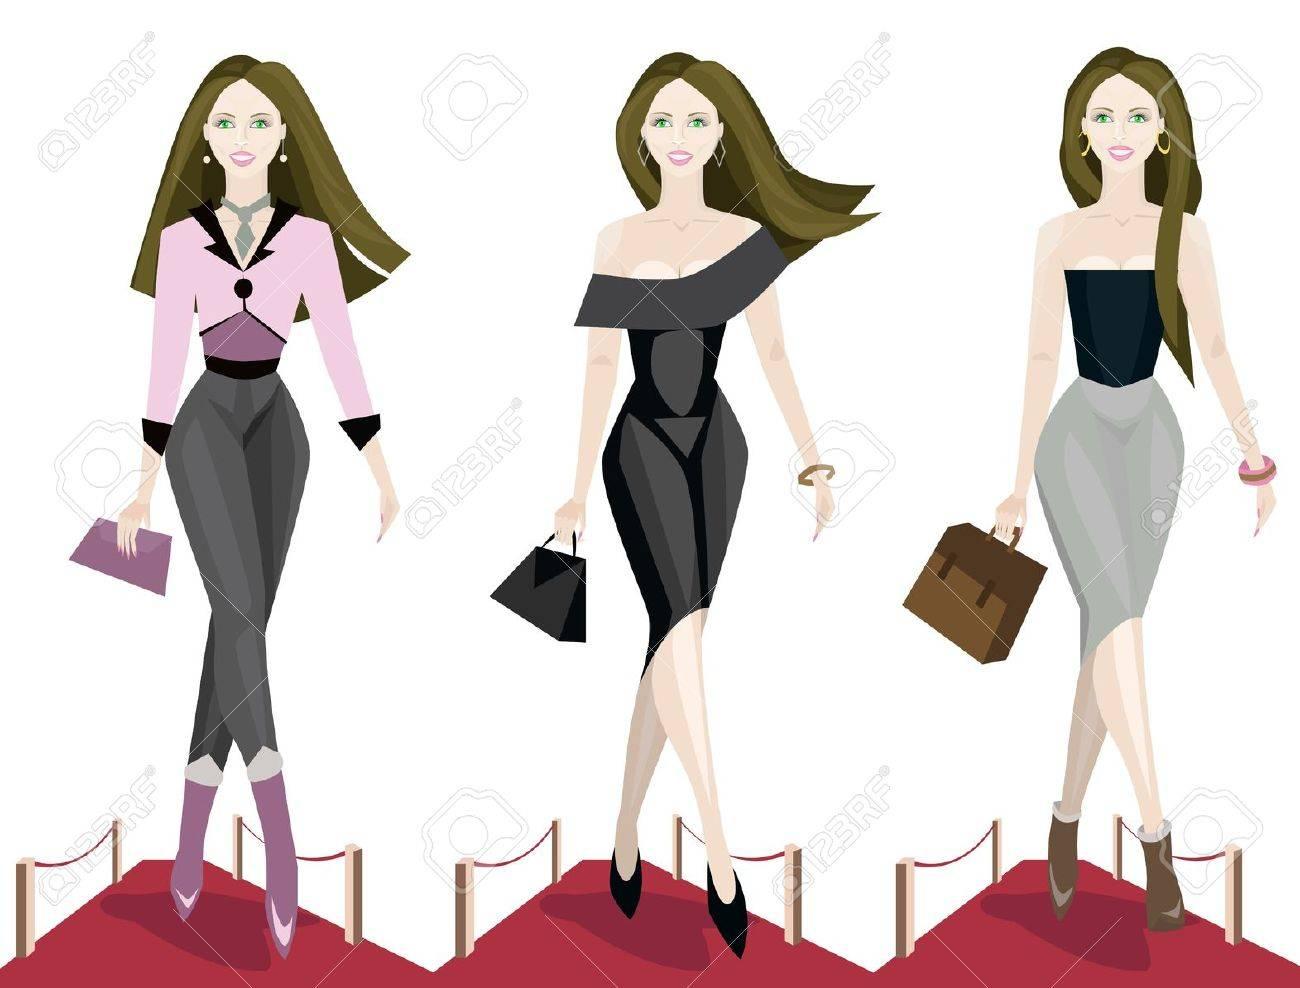 illustration of three fashion models on the catwalk. Stock Vector - 11080958